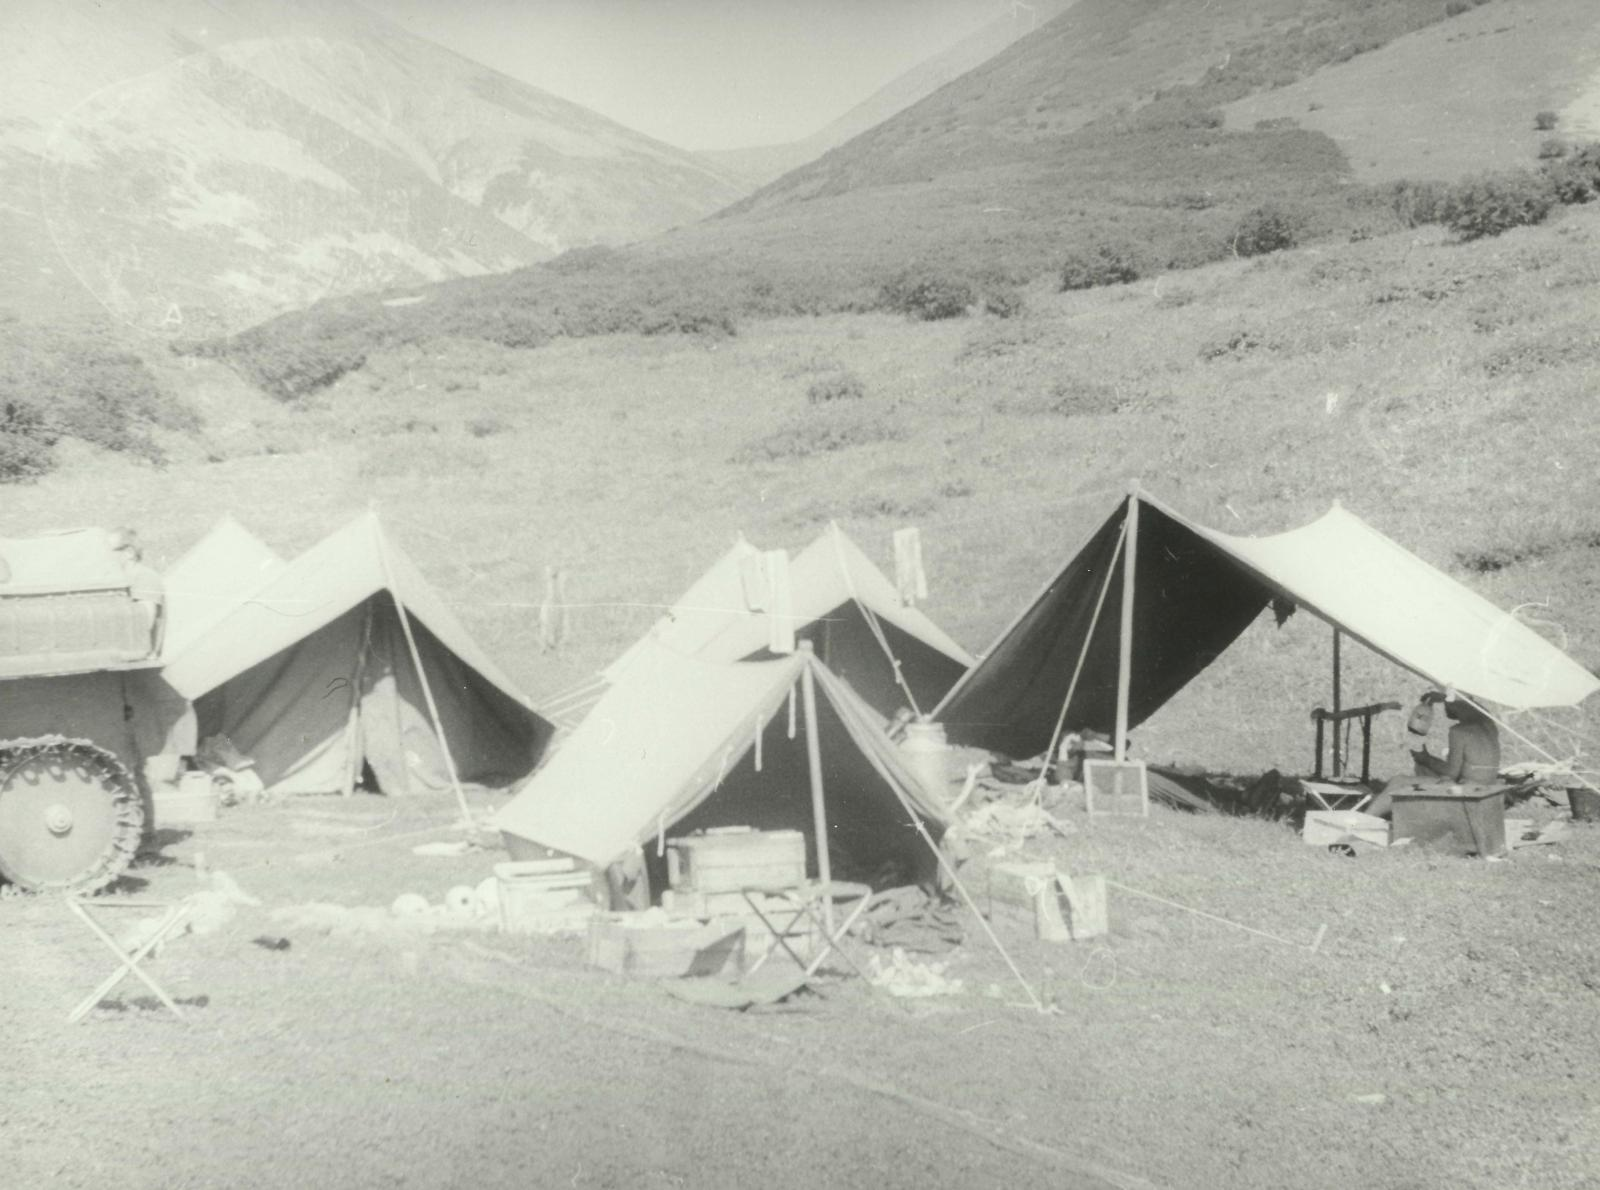 Олюторский хребет, сезон 1981 года